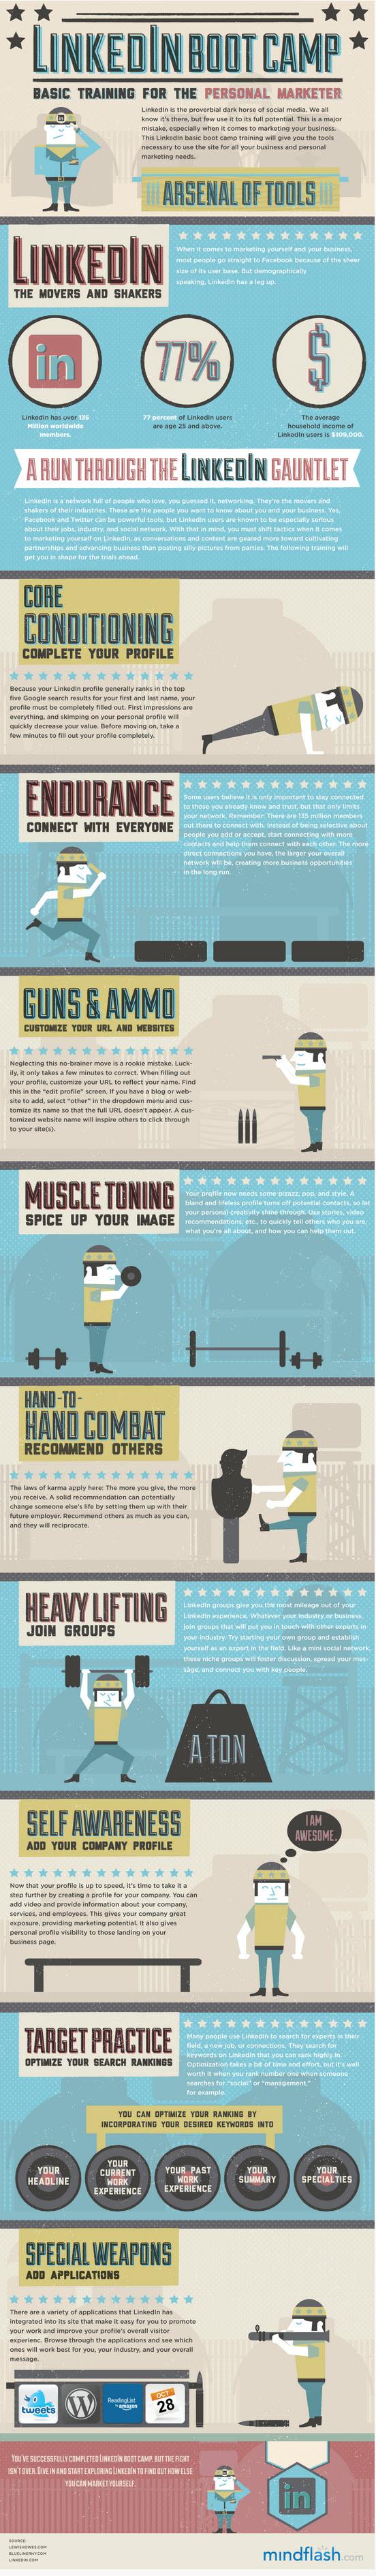 LinkedIn Marketing Infographic